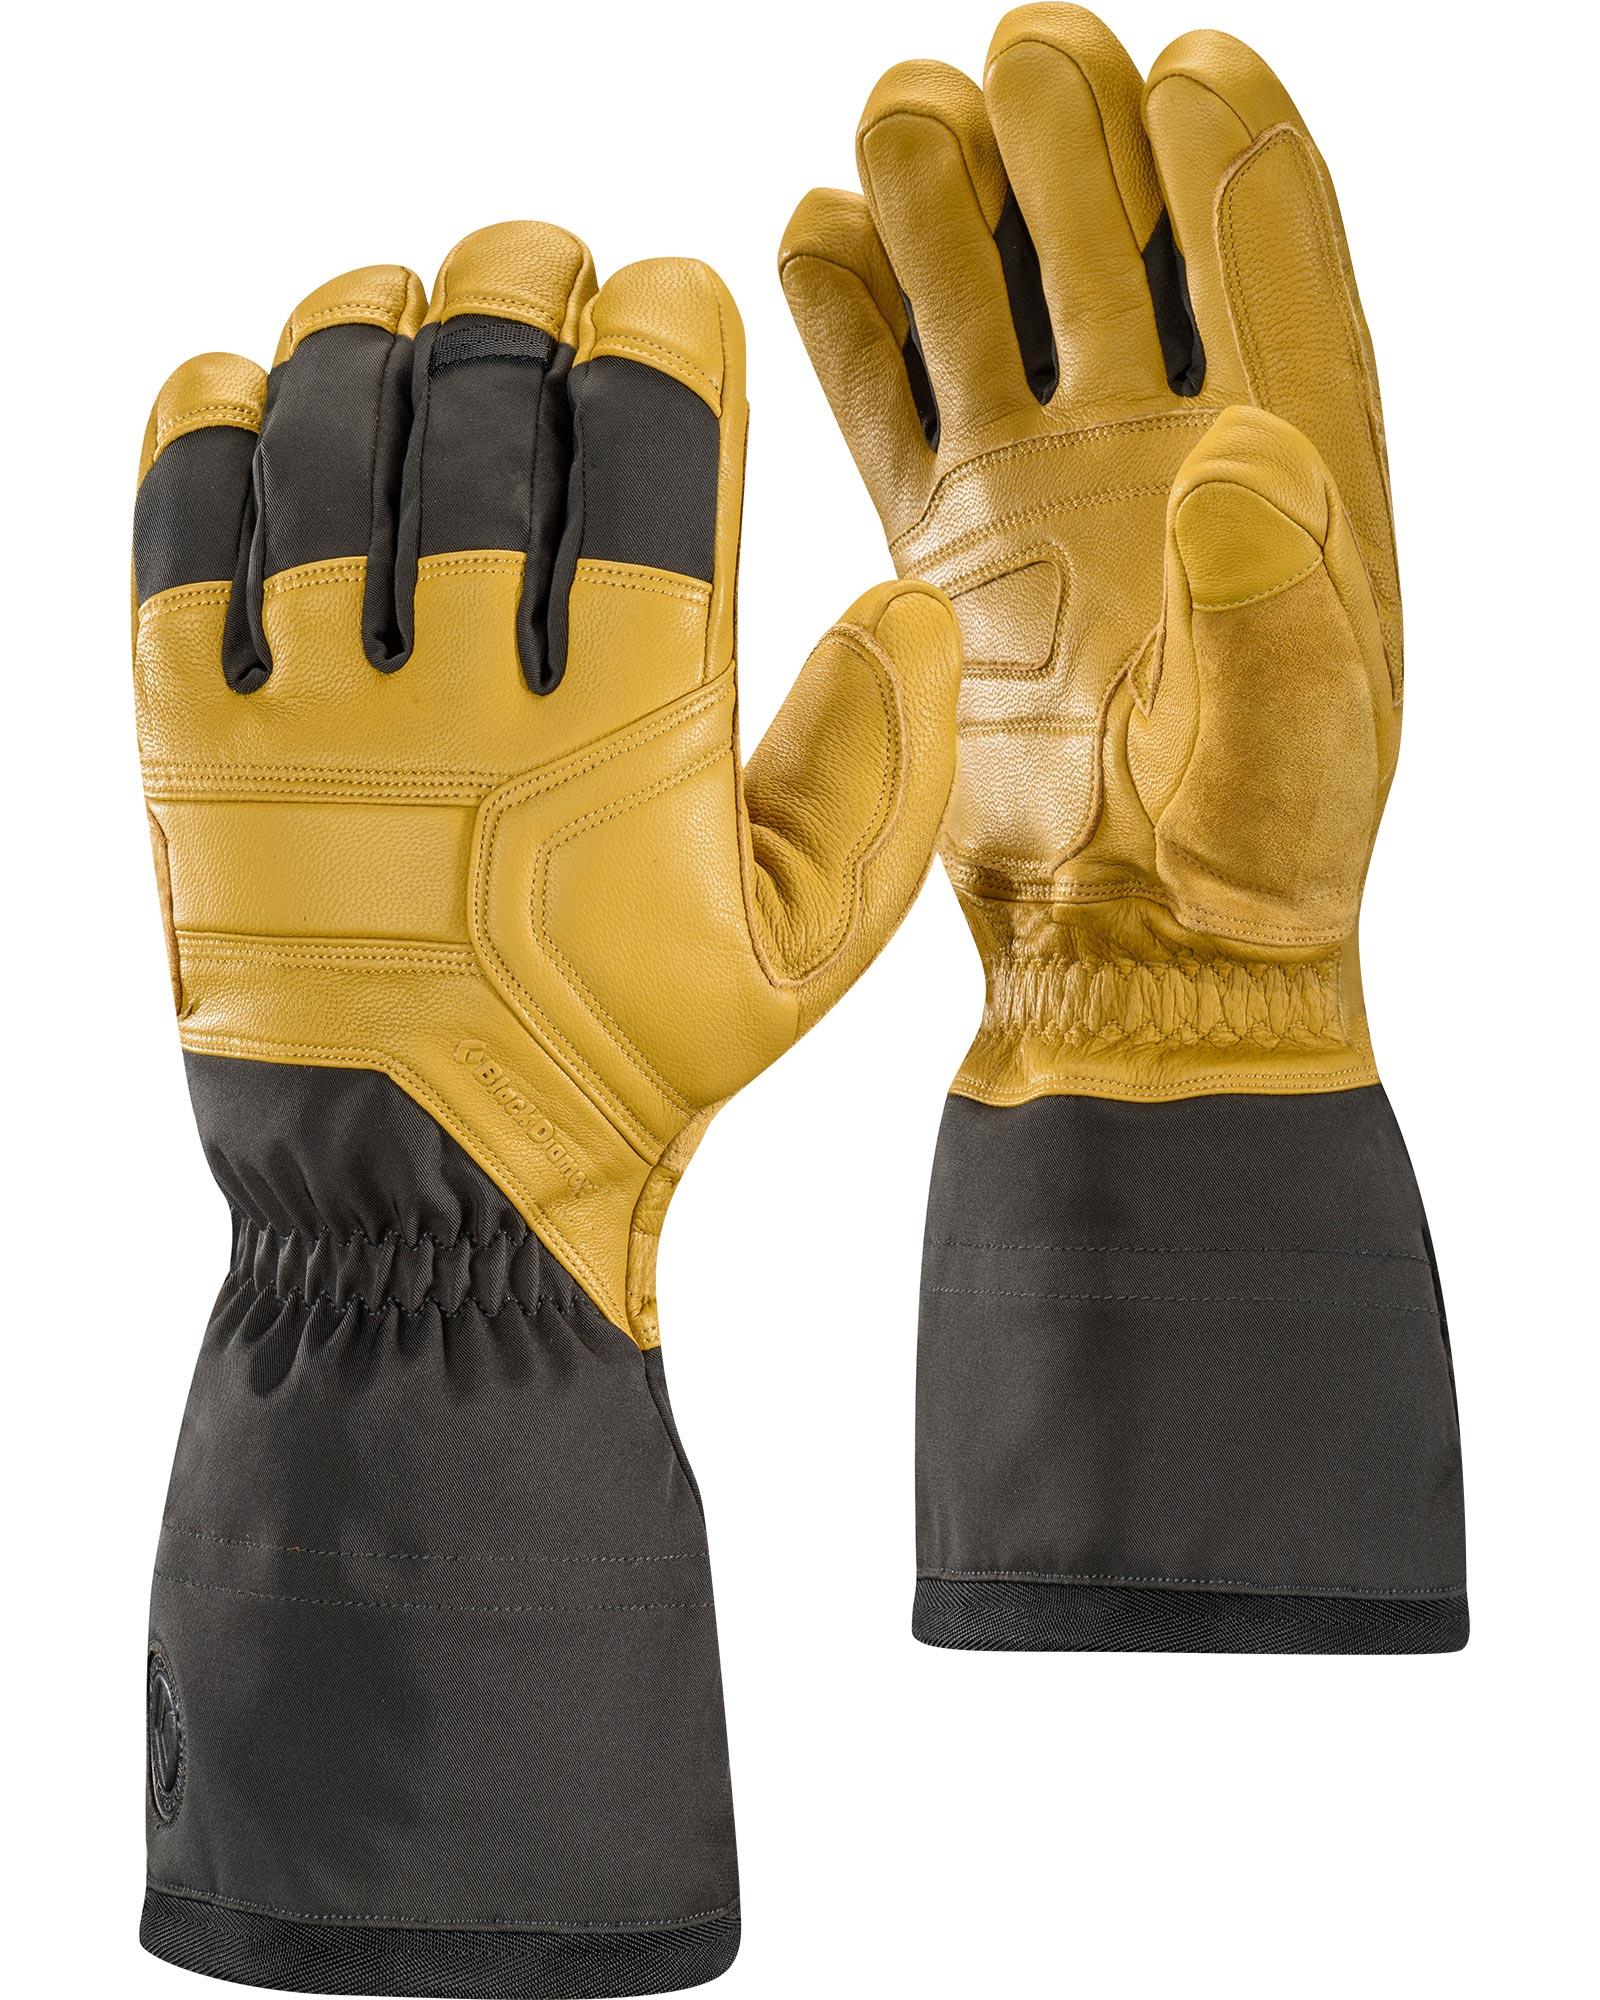 Black Diamond Guide GORE-TEX Gloves 0